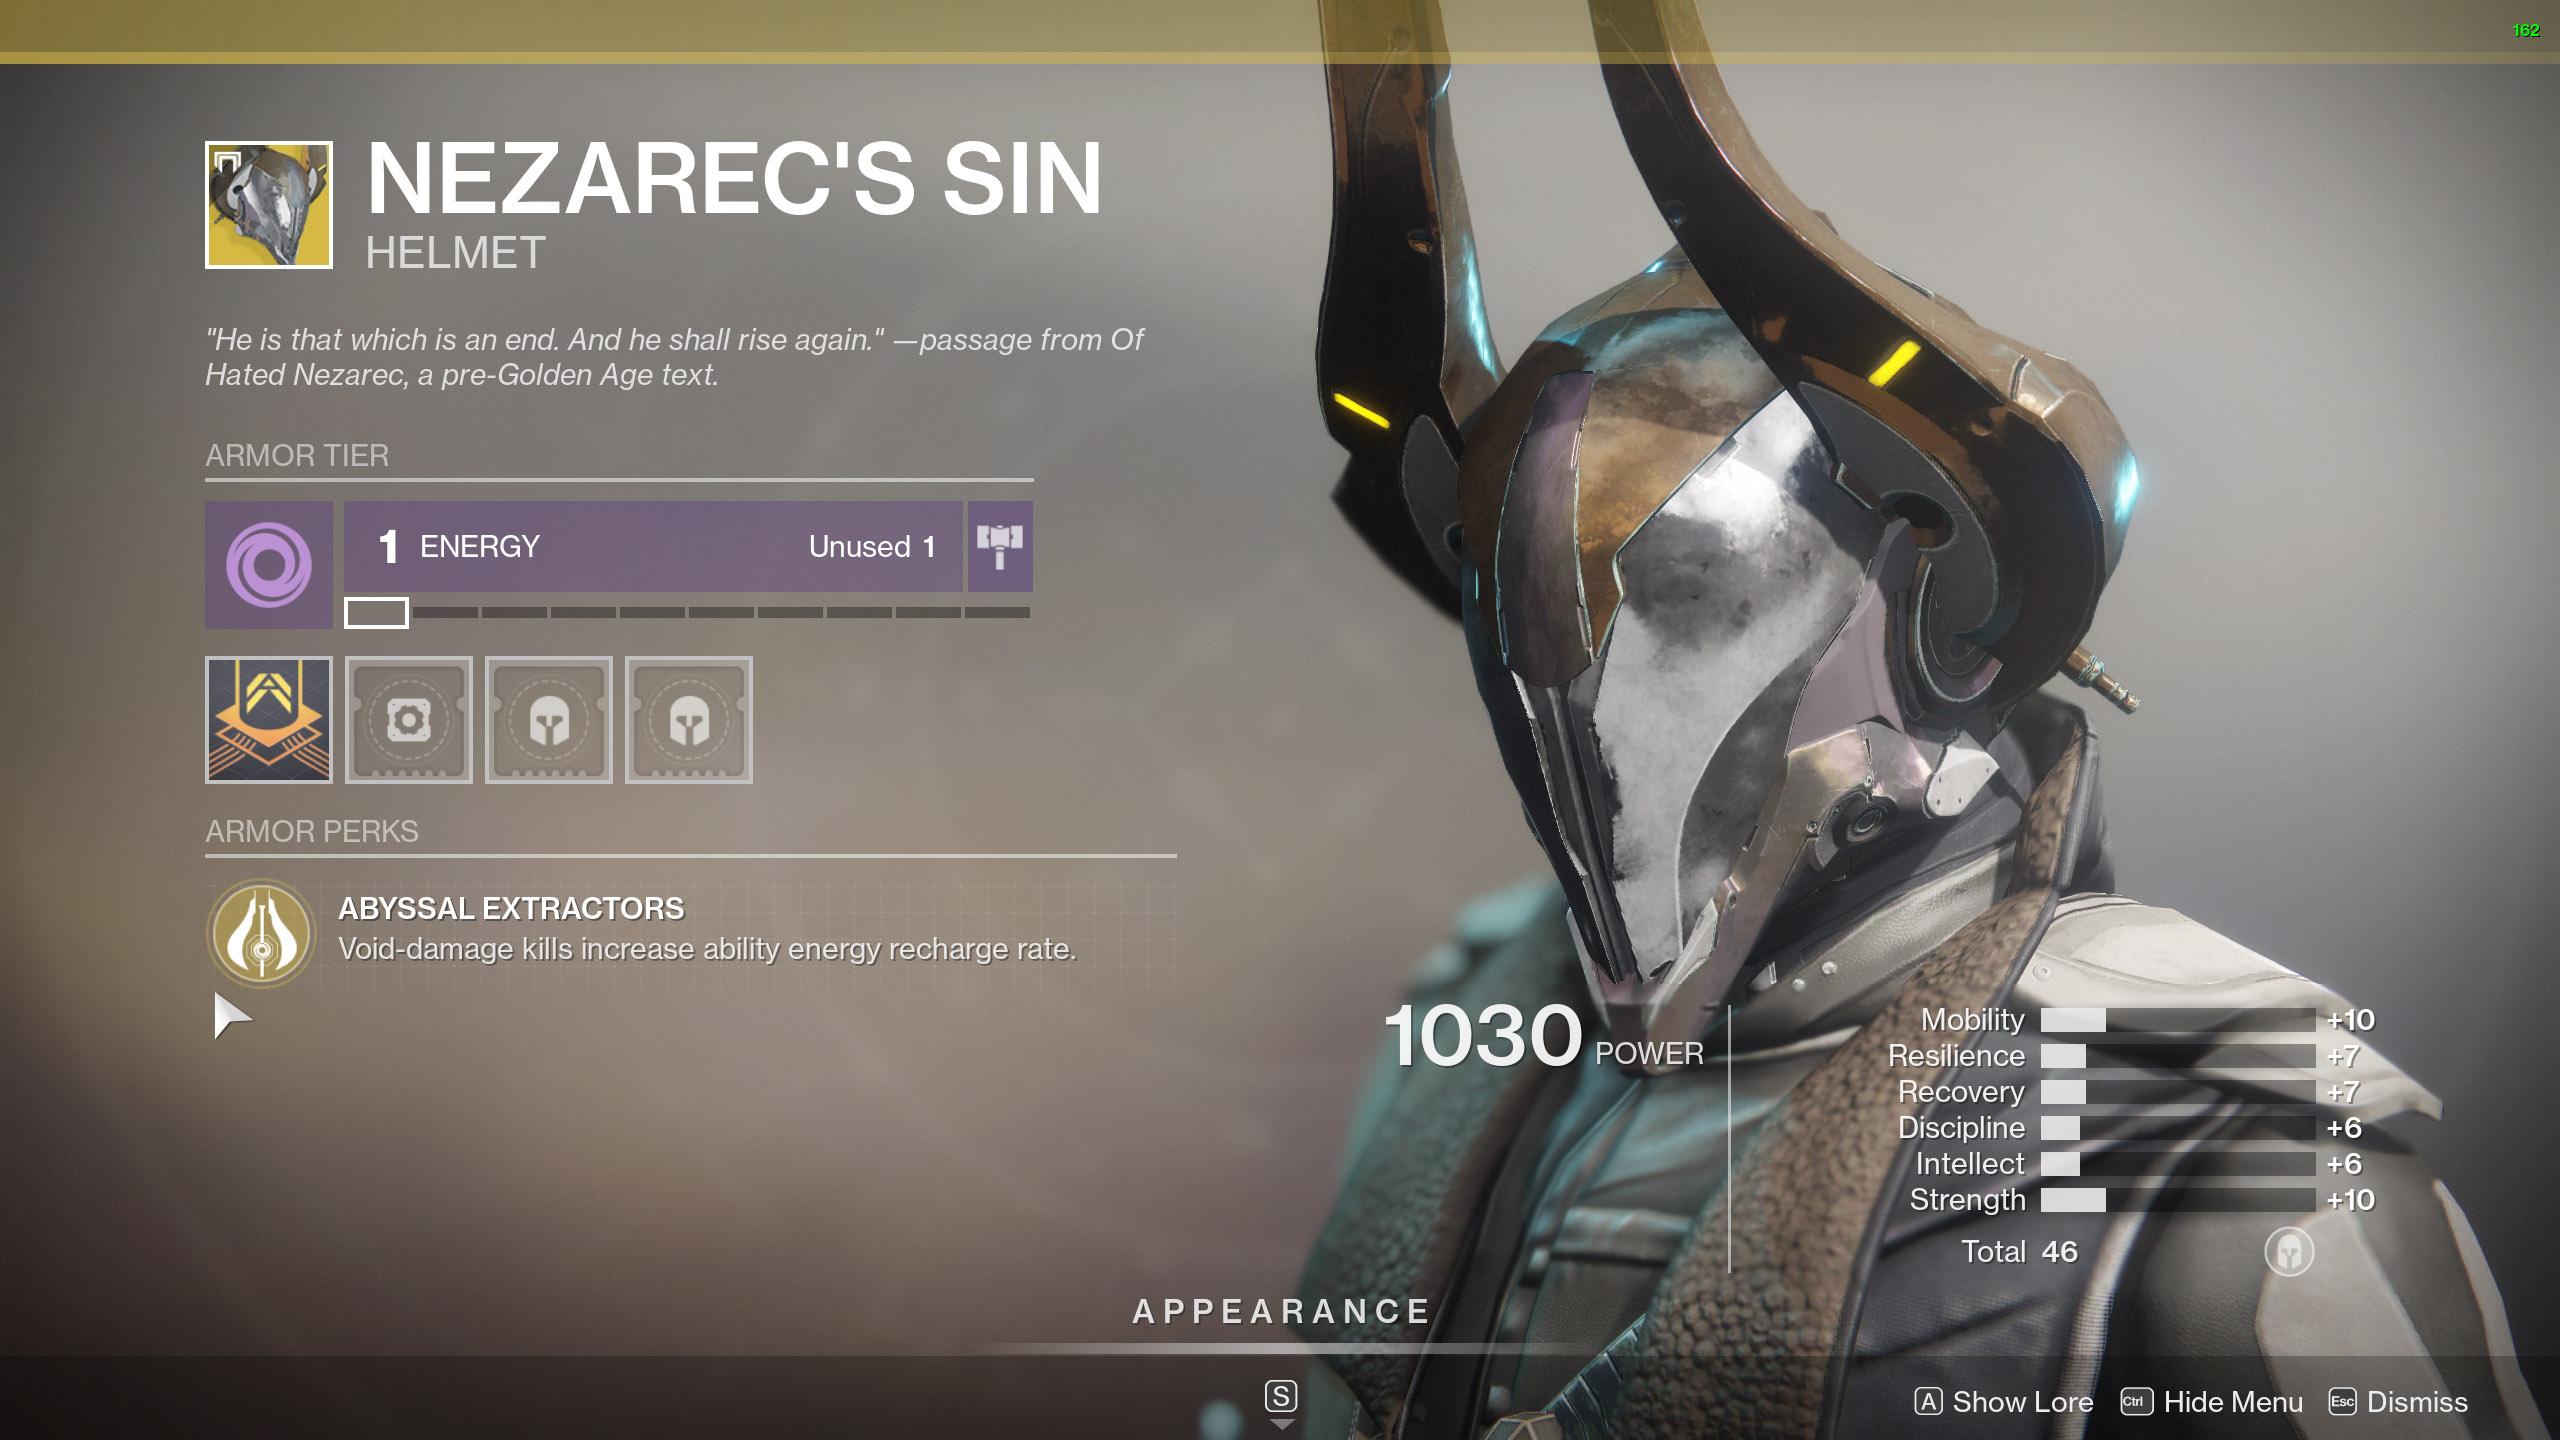 Destiny 2 Warlock Exotic Armor Nezarec's Sin